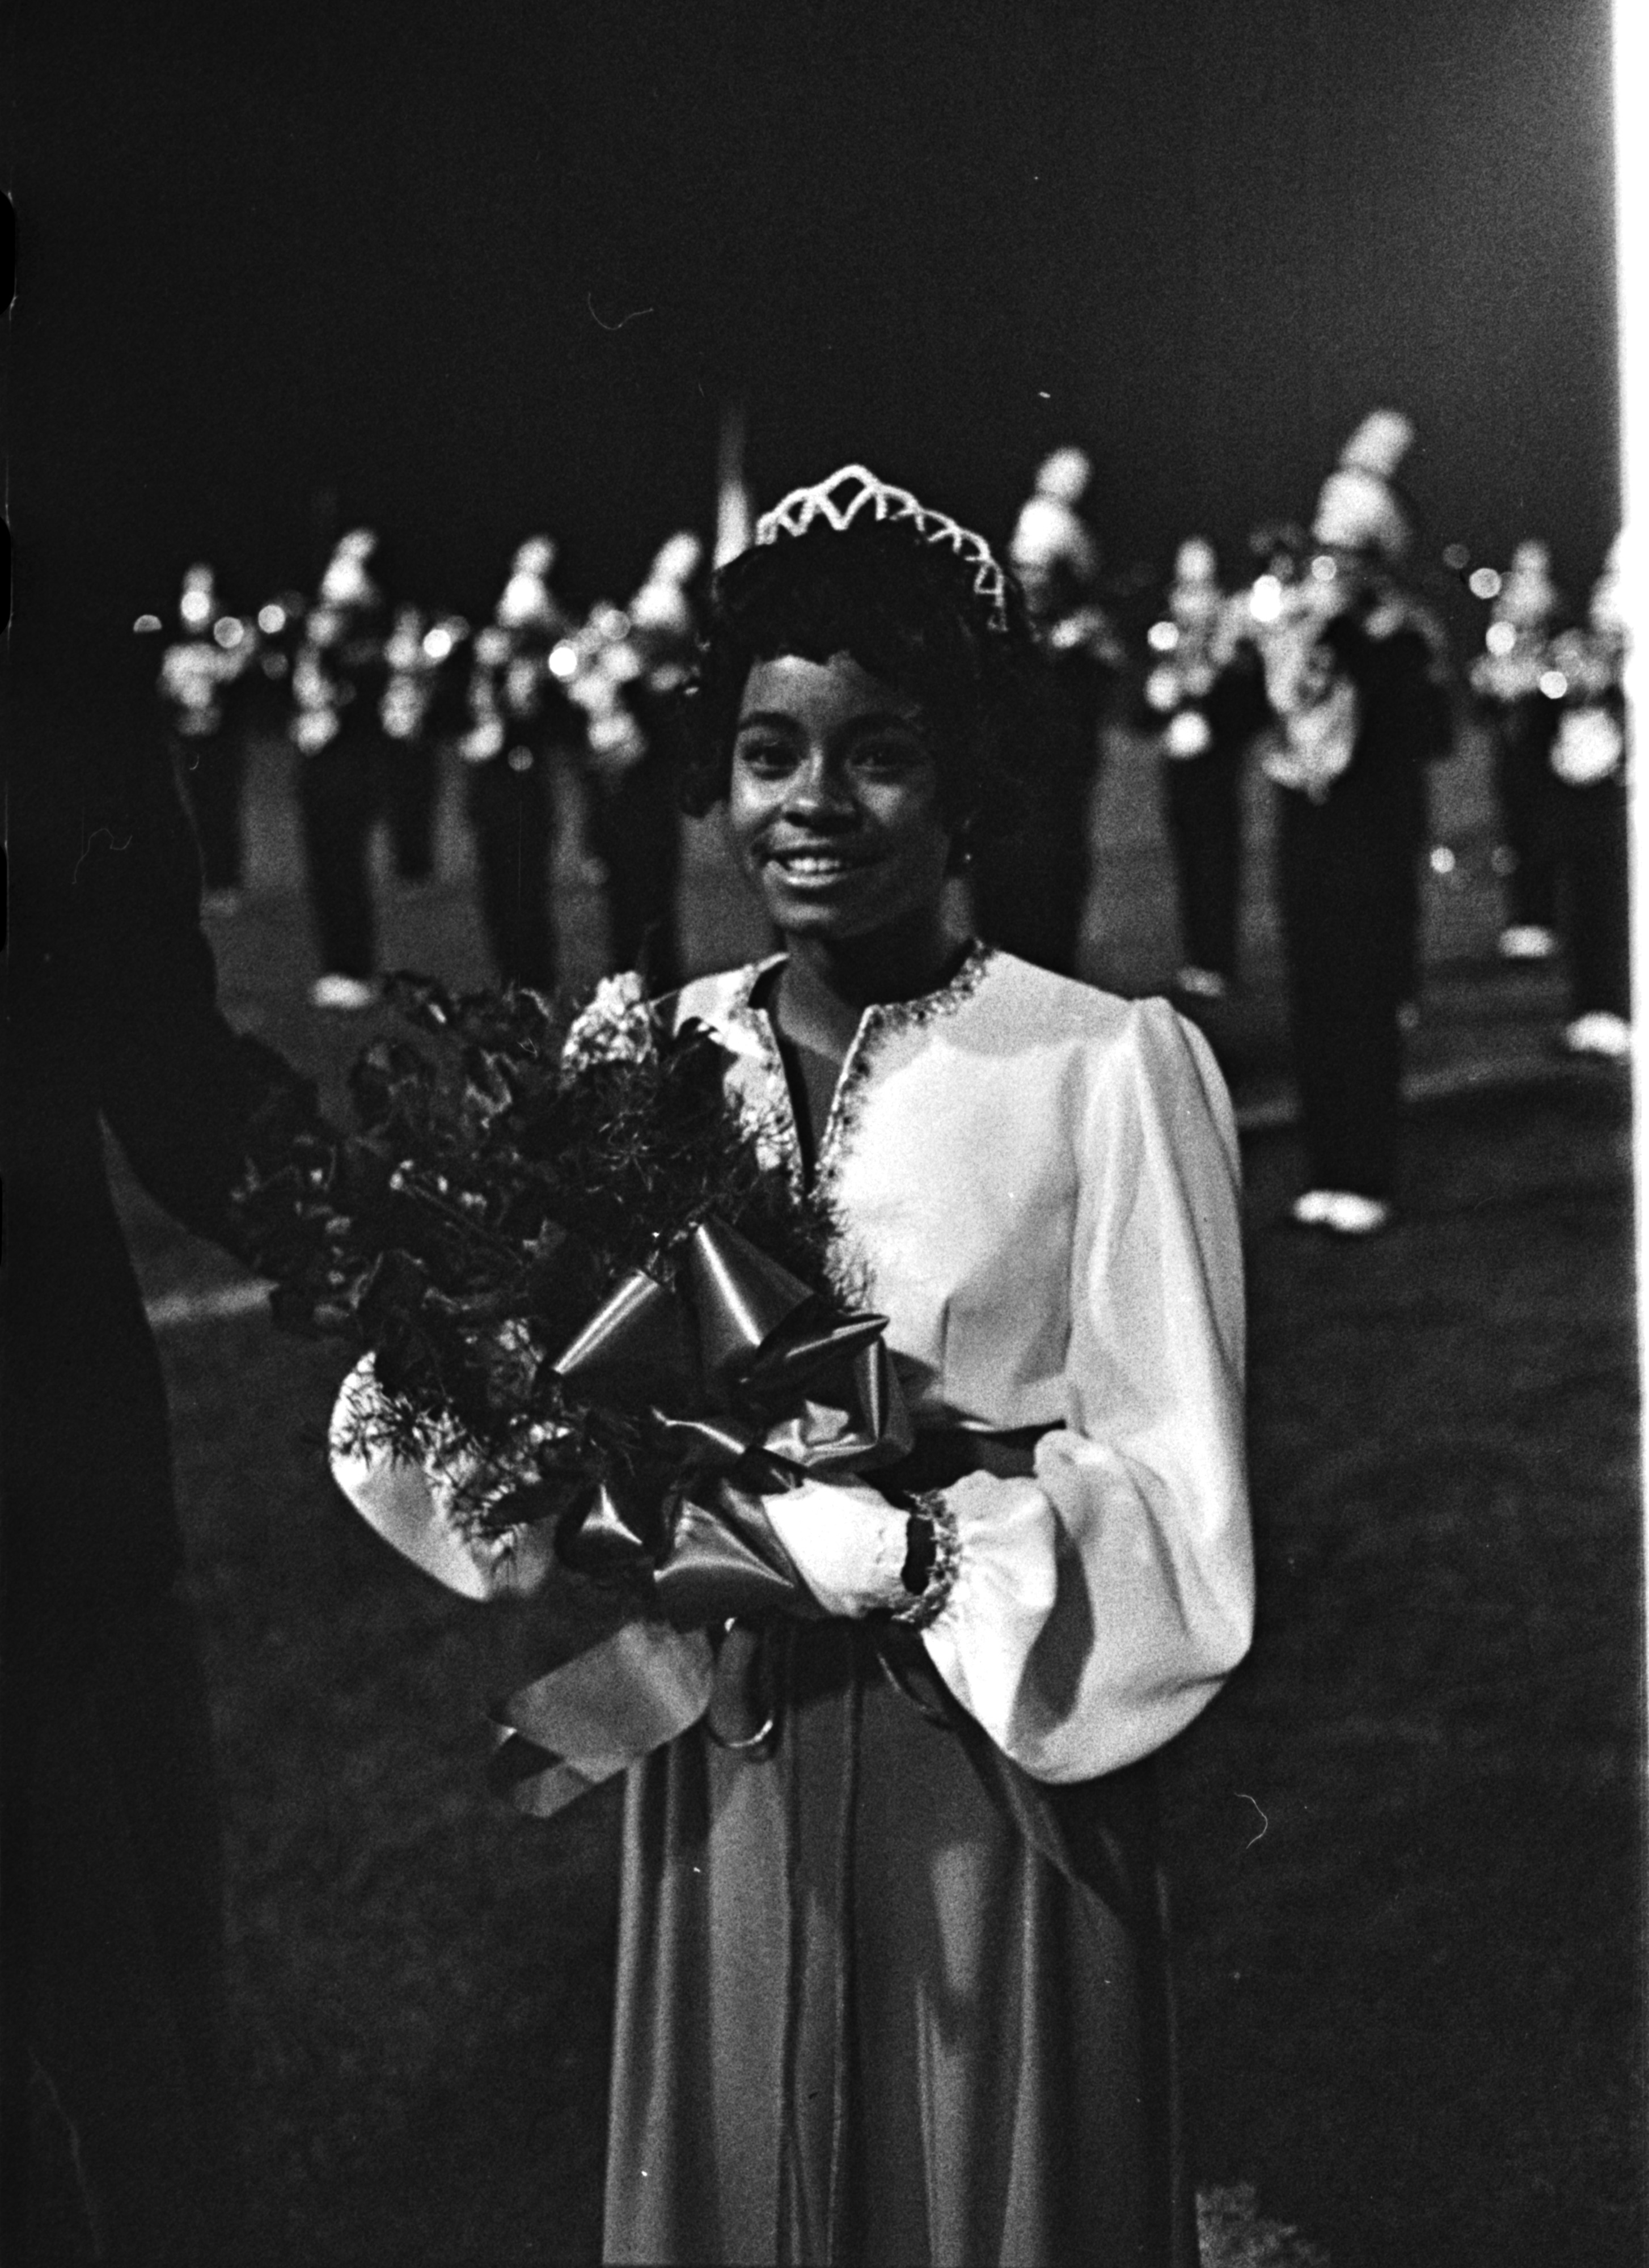 Image from Huron High School's Homecoming Queen, Cherie Lockett, October 1971